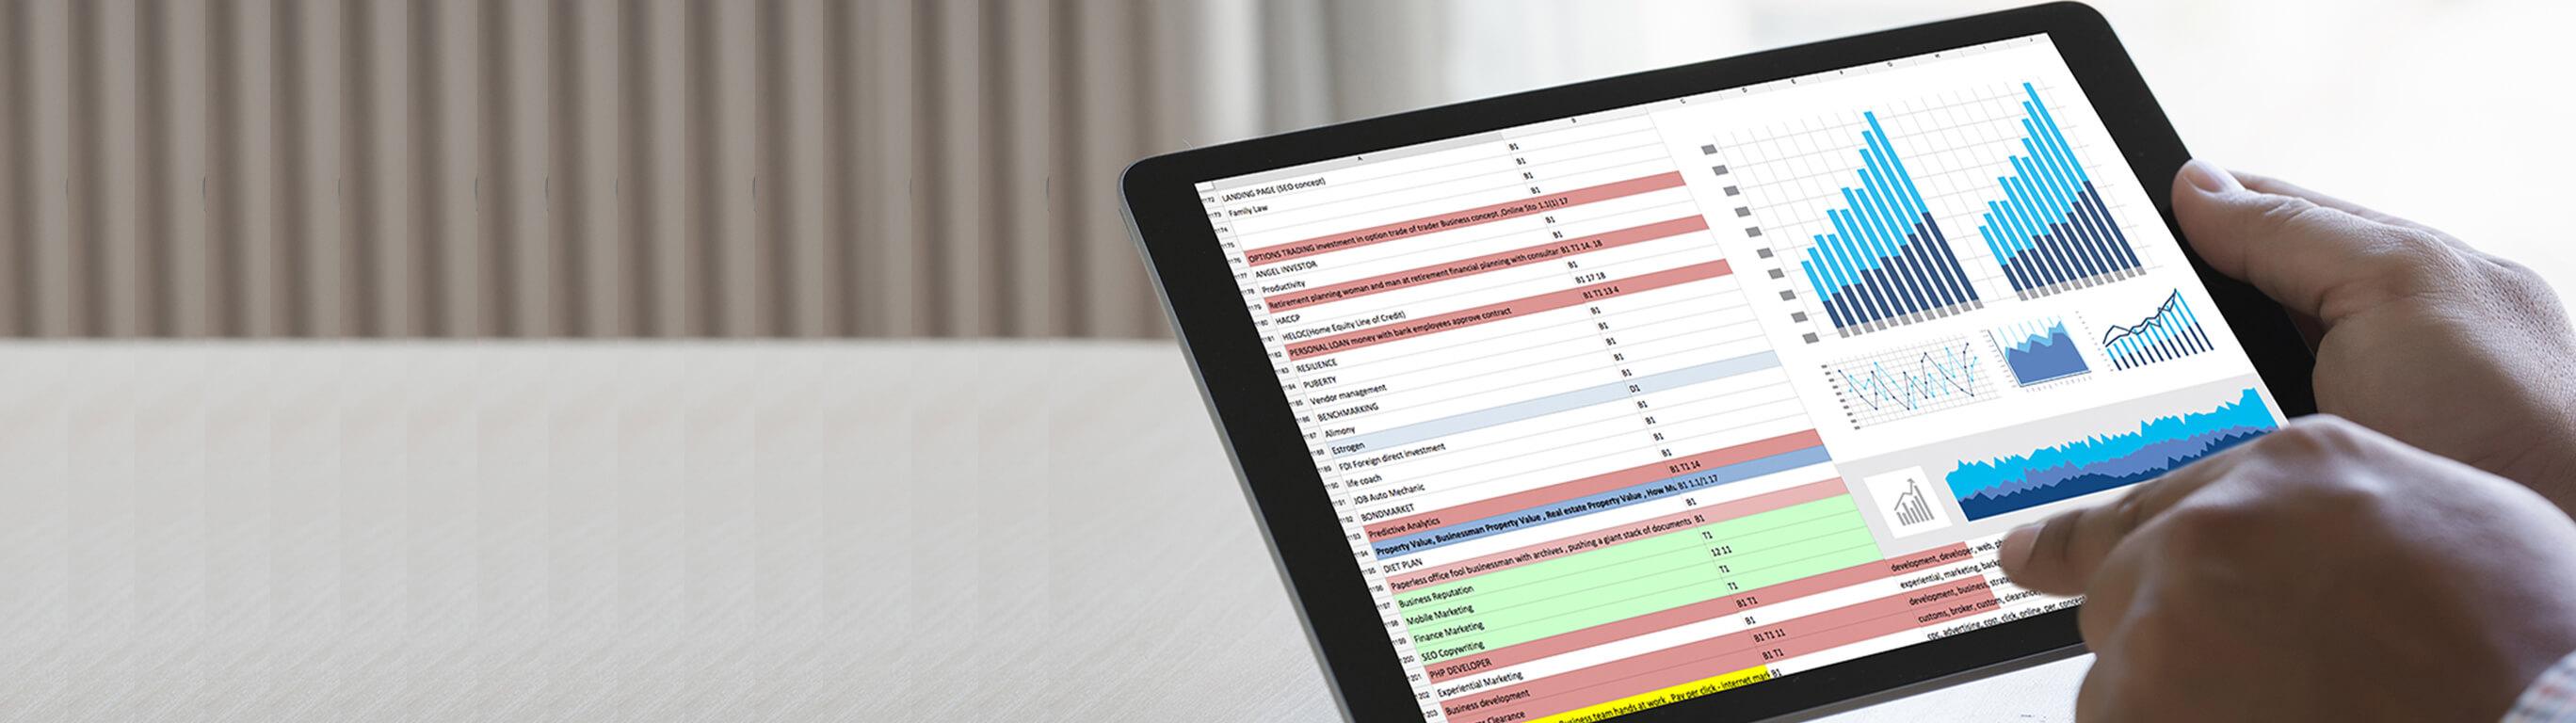 Digital Field Service Management